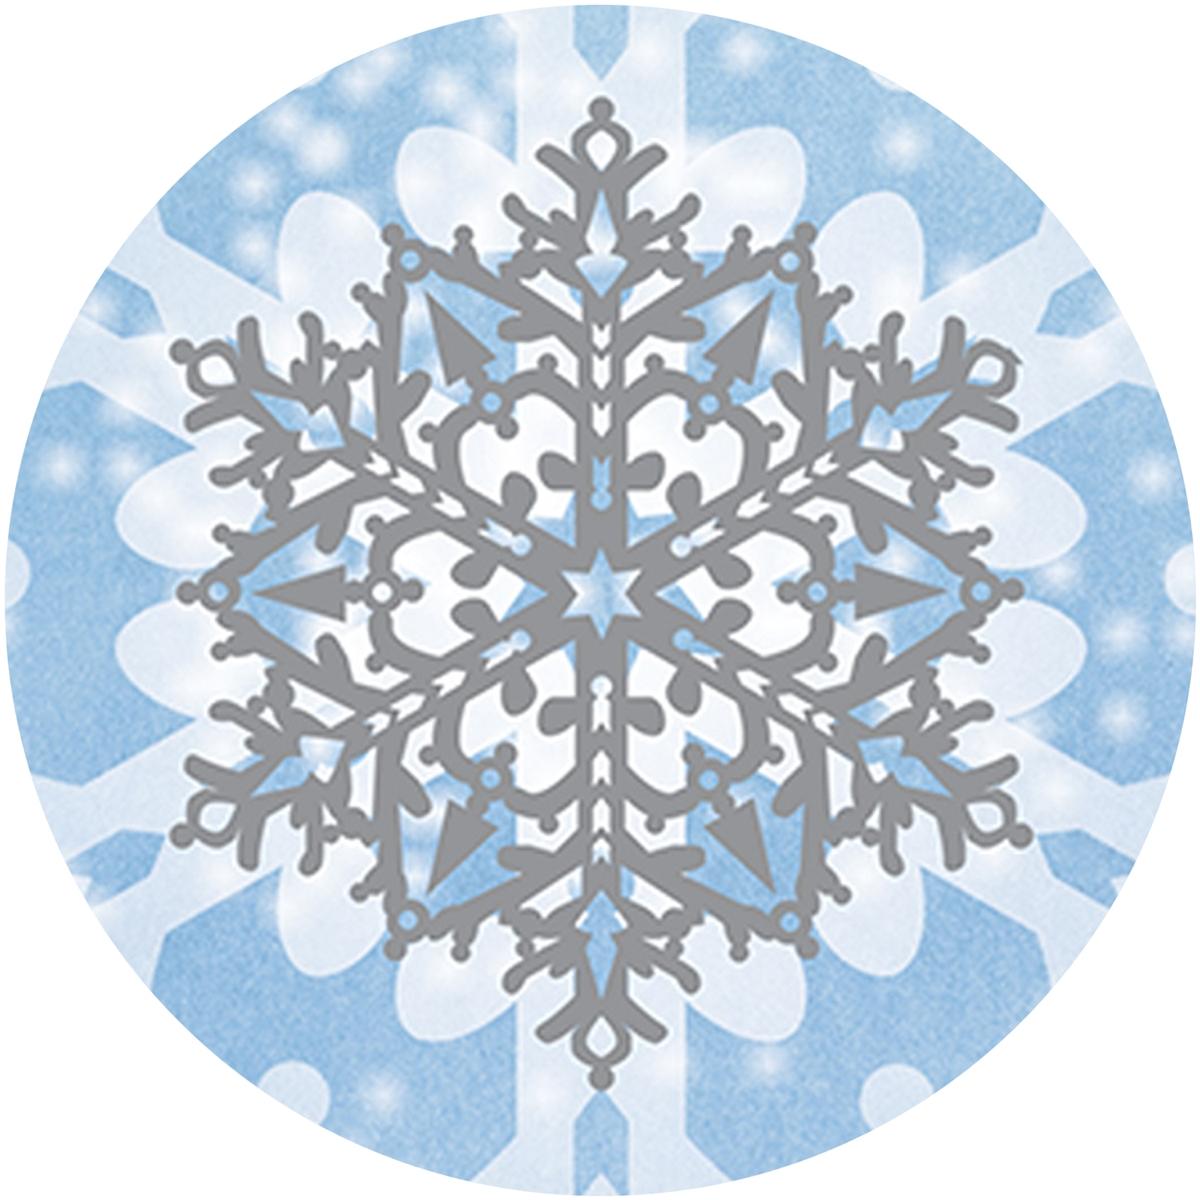 Joy Snowflake Envelope Seal